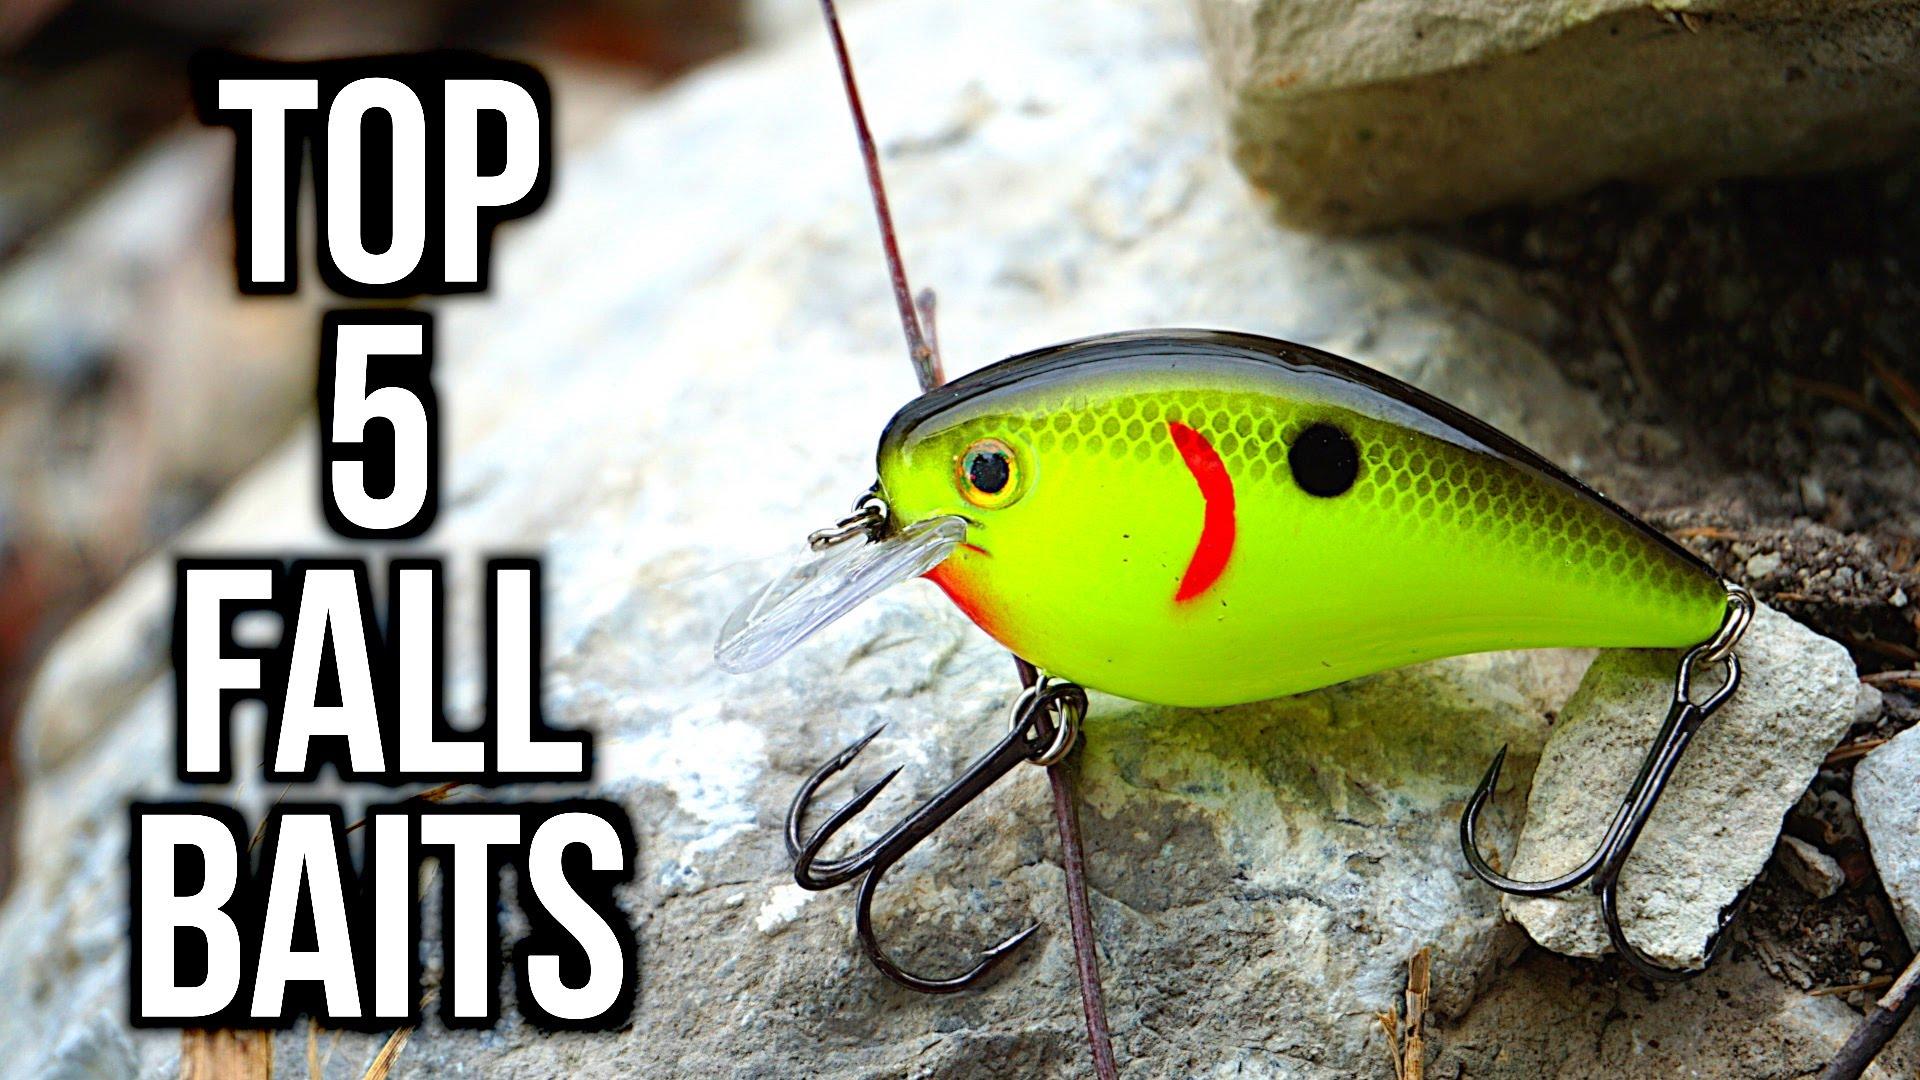 Top 5 Fall Bass Fishing Lures - Angler HQ